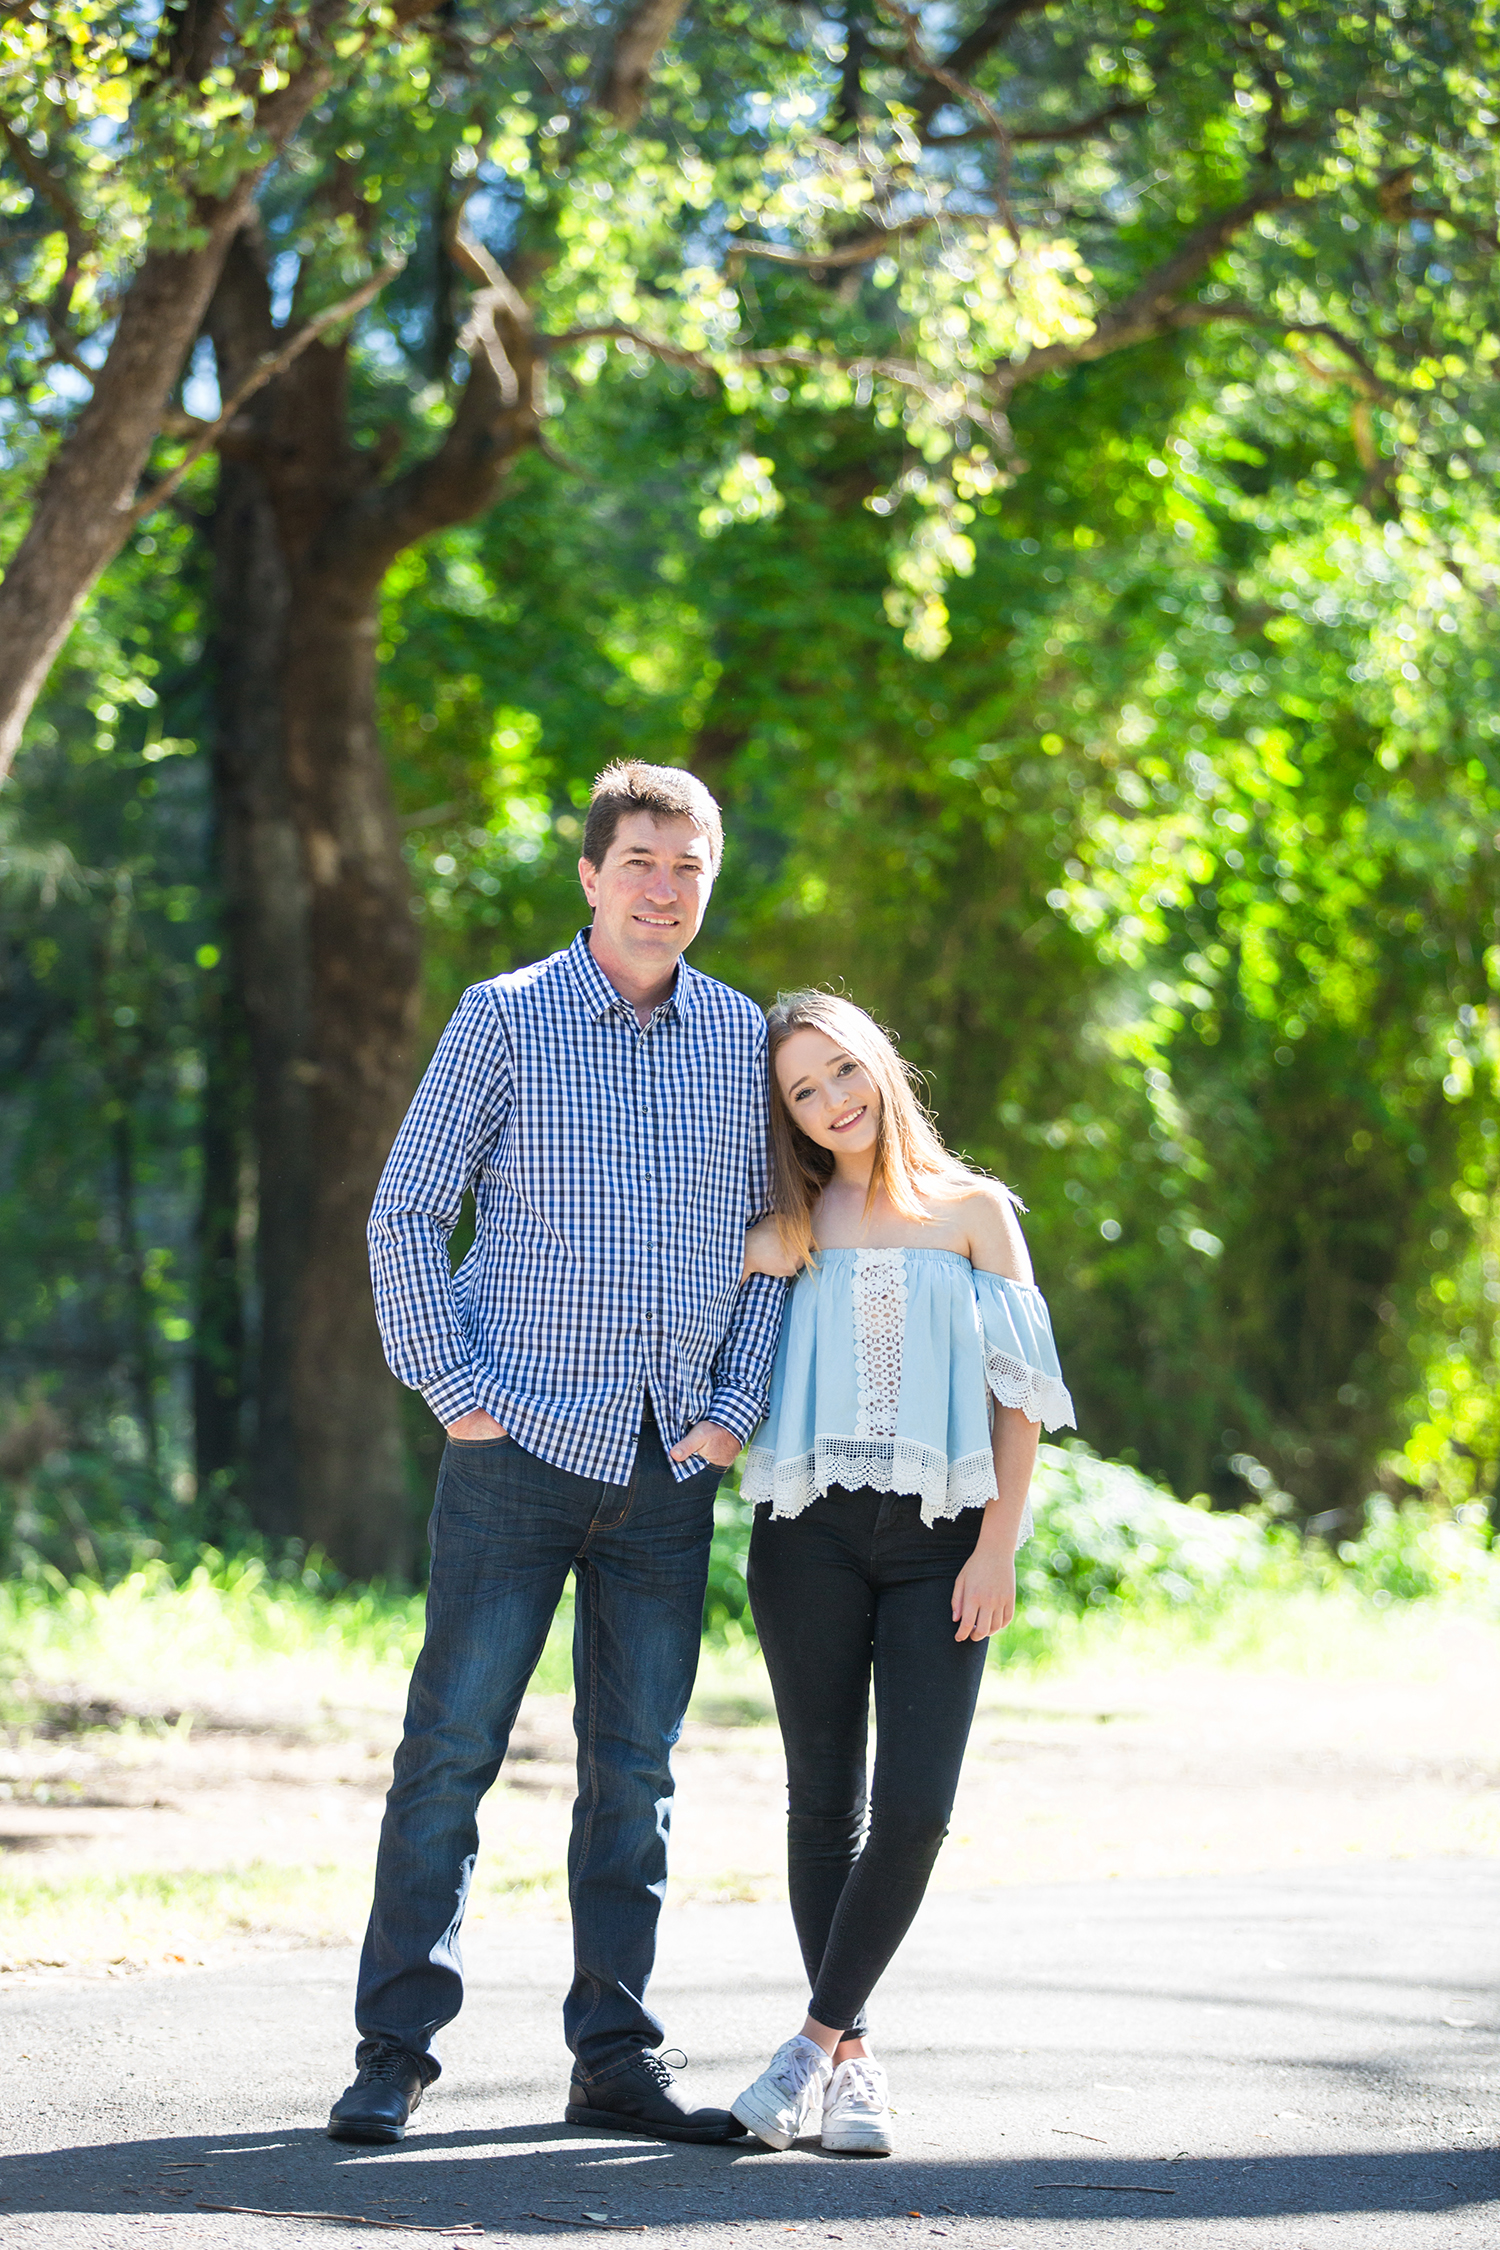 Sydney Family Photographer - Jennifer Lam Photography (13).jpg